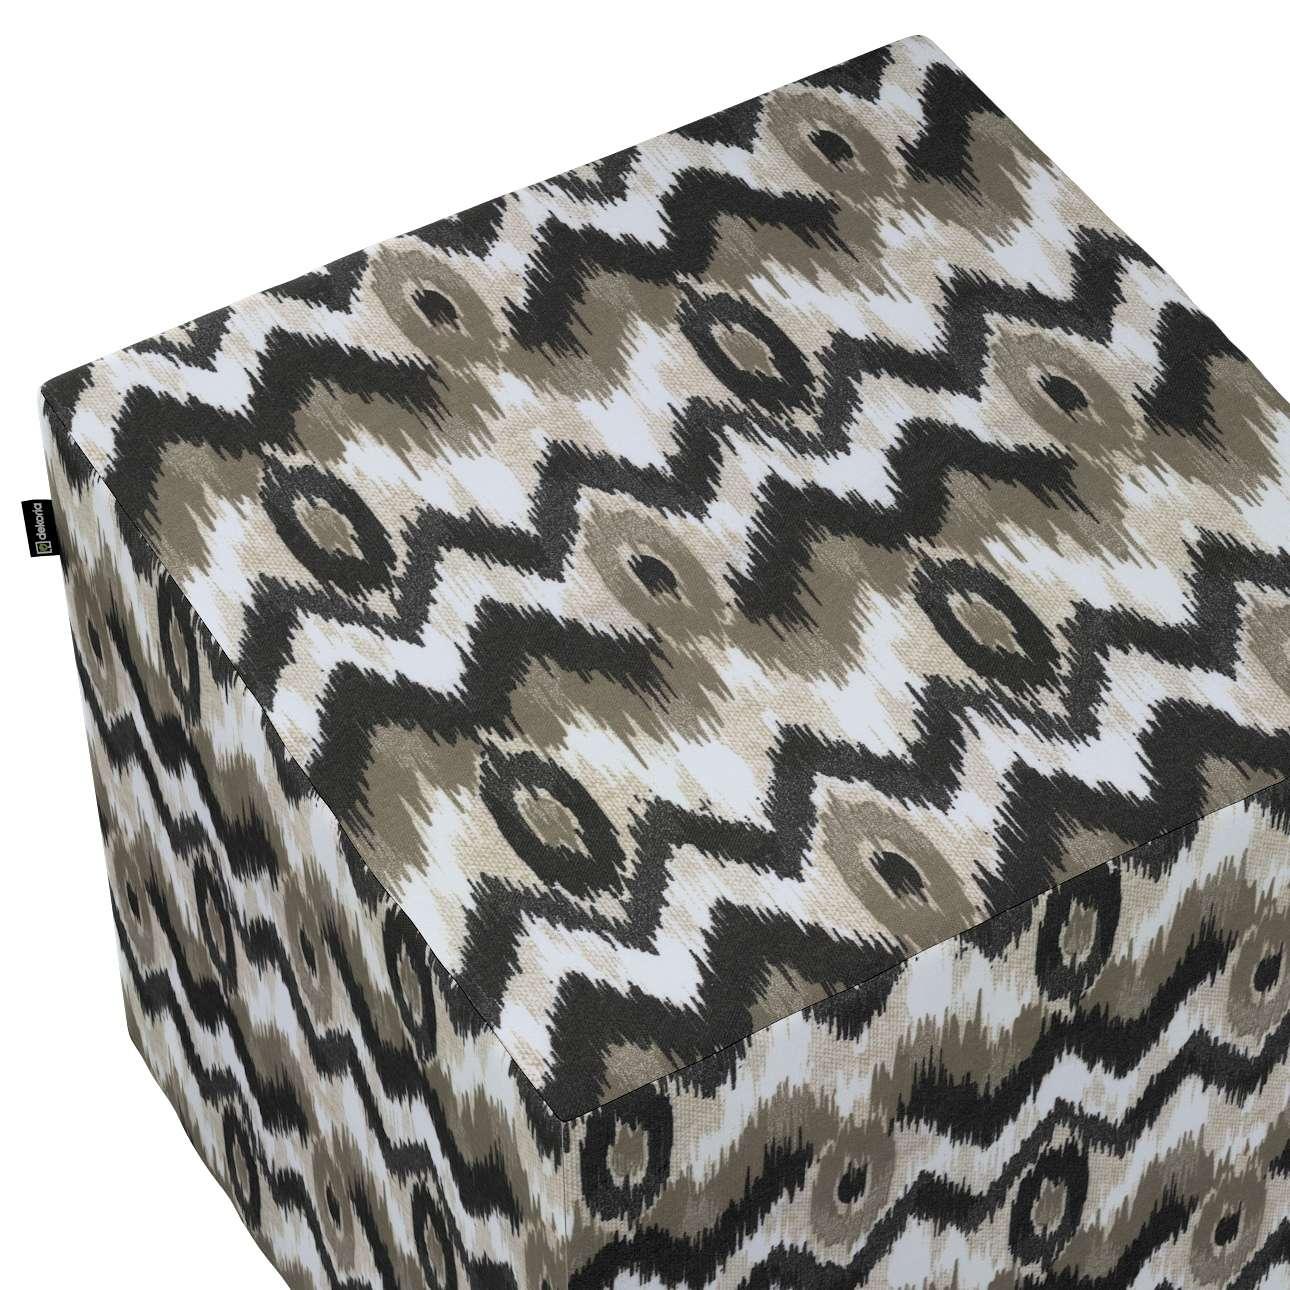 Pufa kostka w kolekcji Modern, tkanina: 141-88